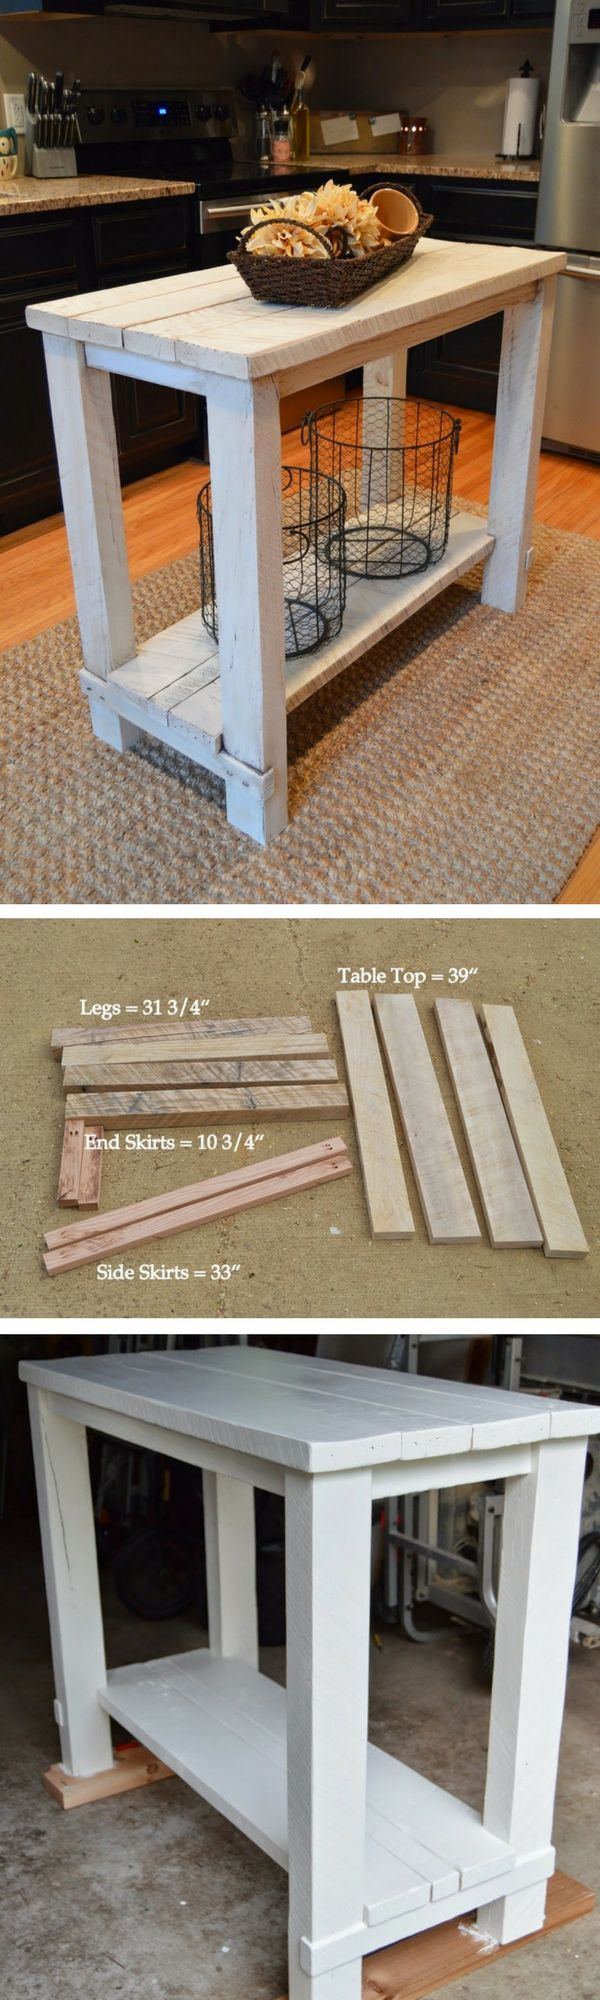 best wood work progects images on pinterest garages